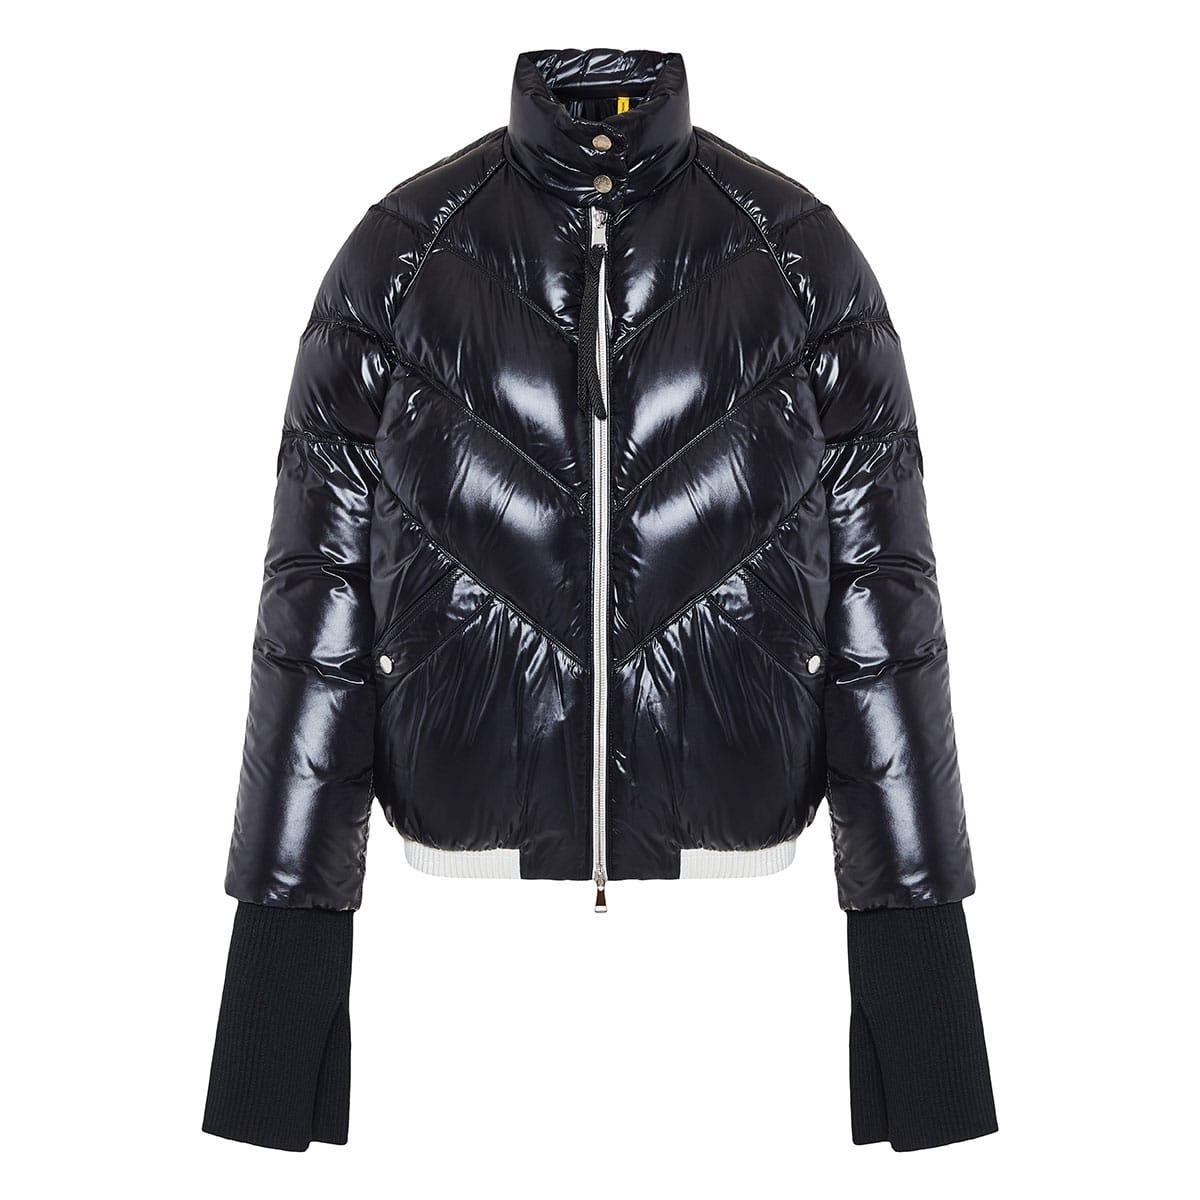 2 MONCLER 1952 + VALEXTRA Yalou down jacket